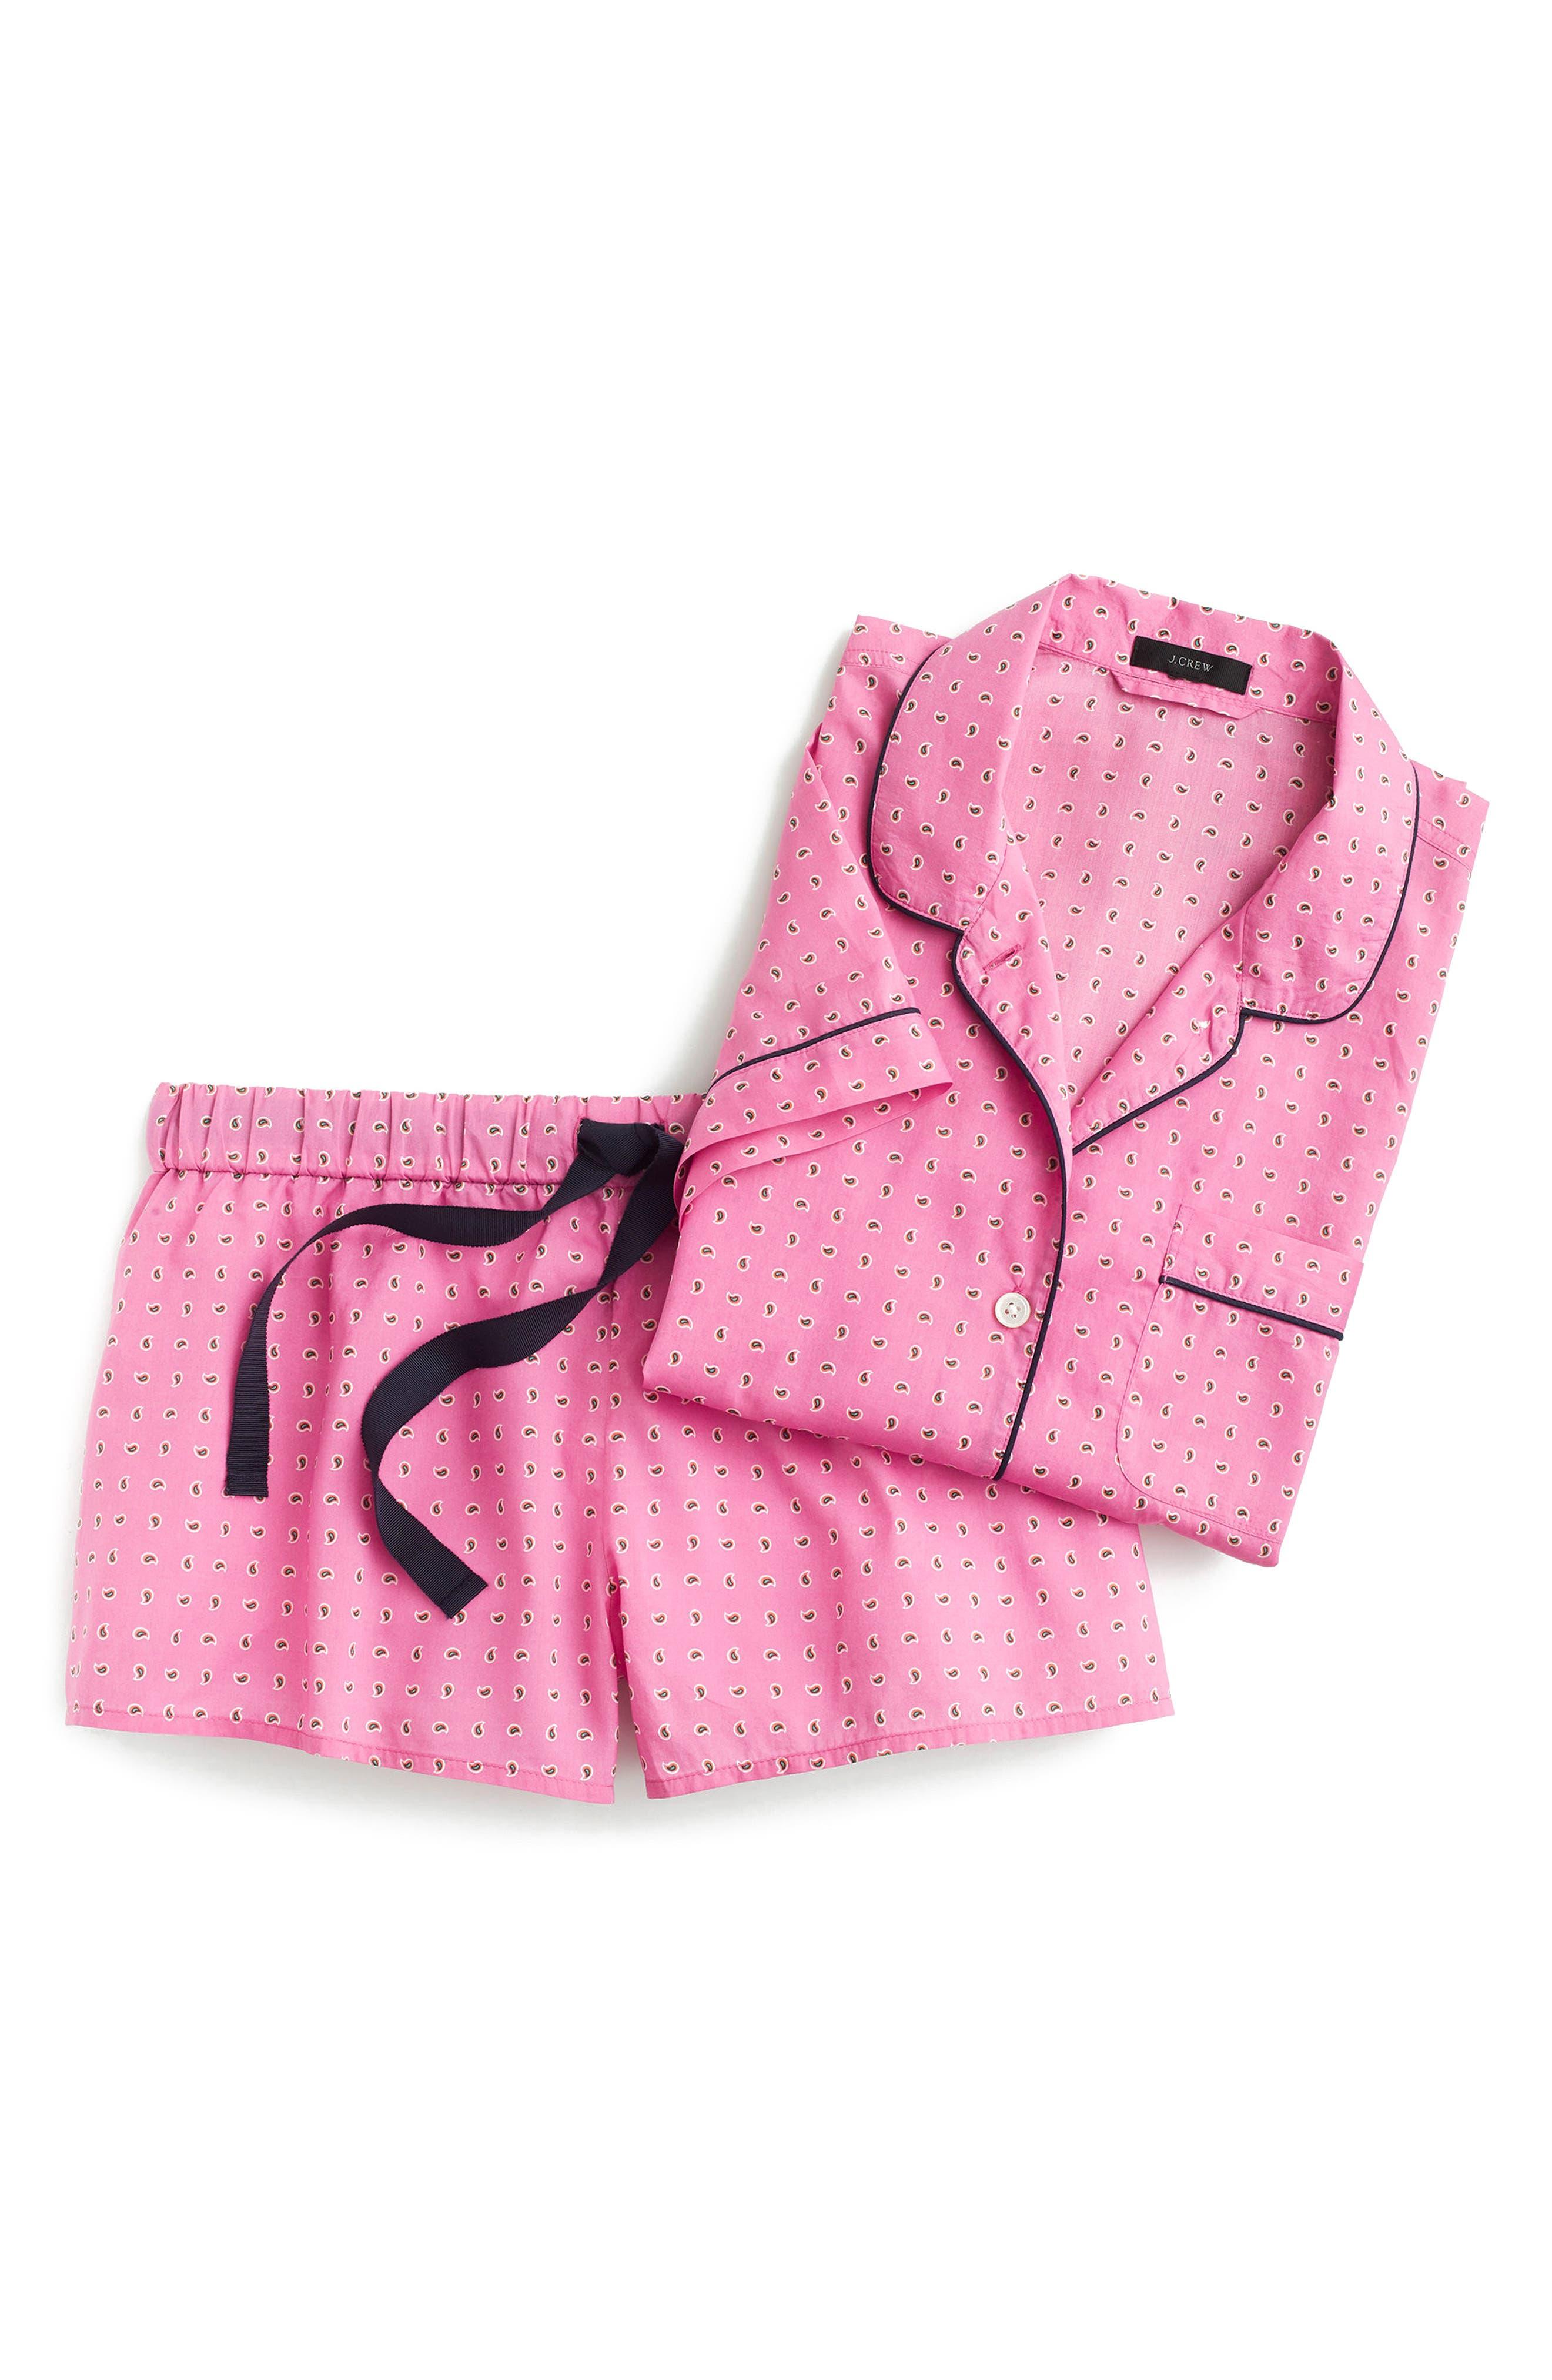 Short Cotton Pajamas,                             Alternate thumbnail 3, color,                             650